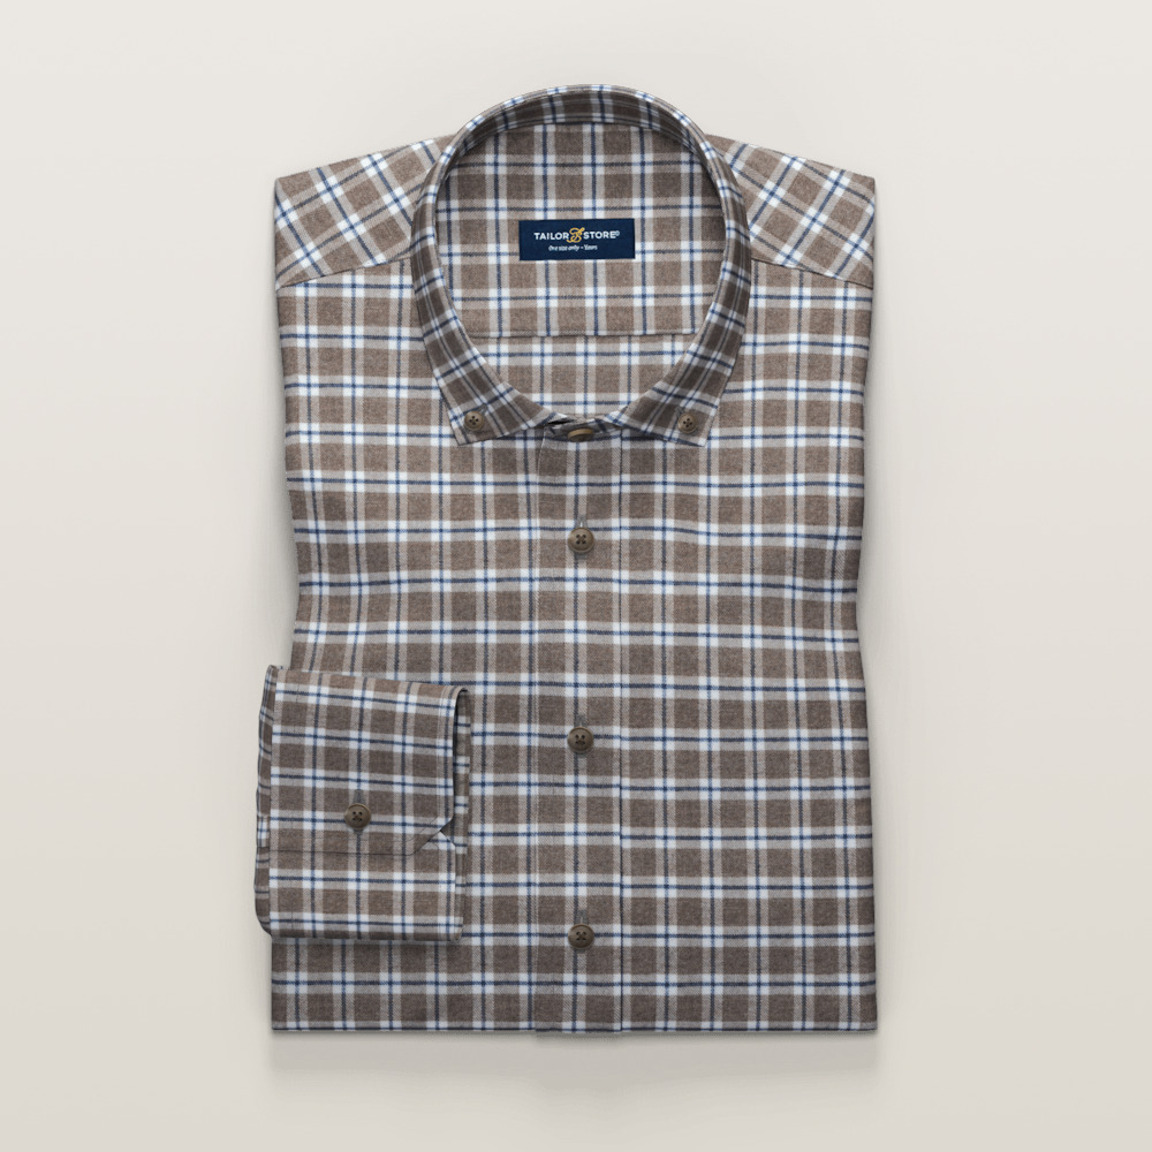 Brown flannel shirt